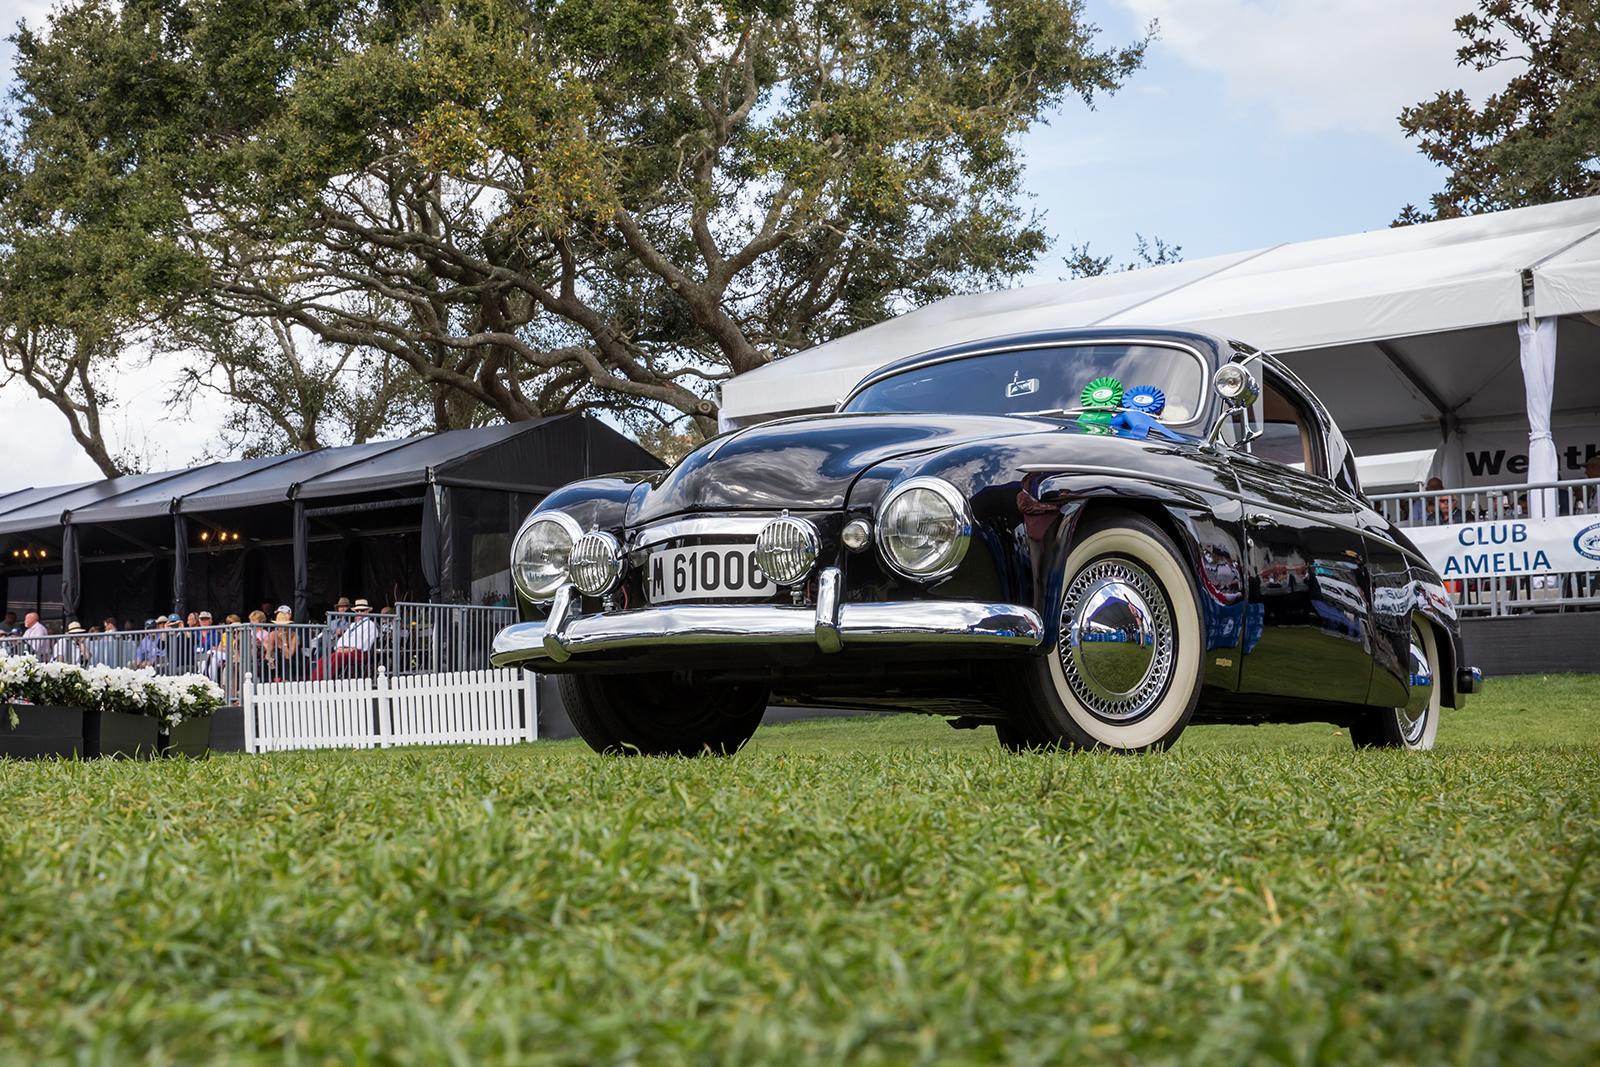 2019 VW - Amelia Concours 109A - Deremer Studios LLC